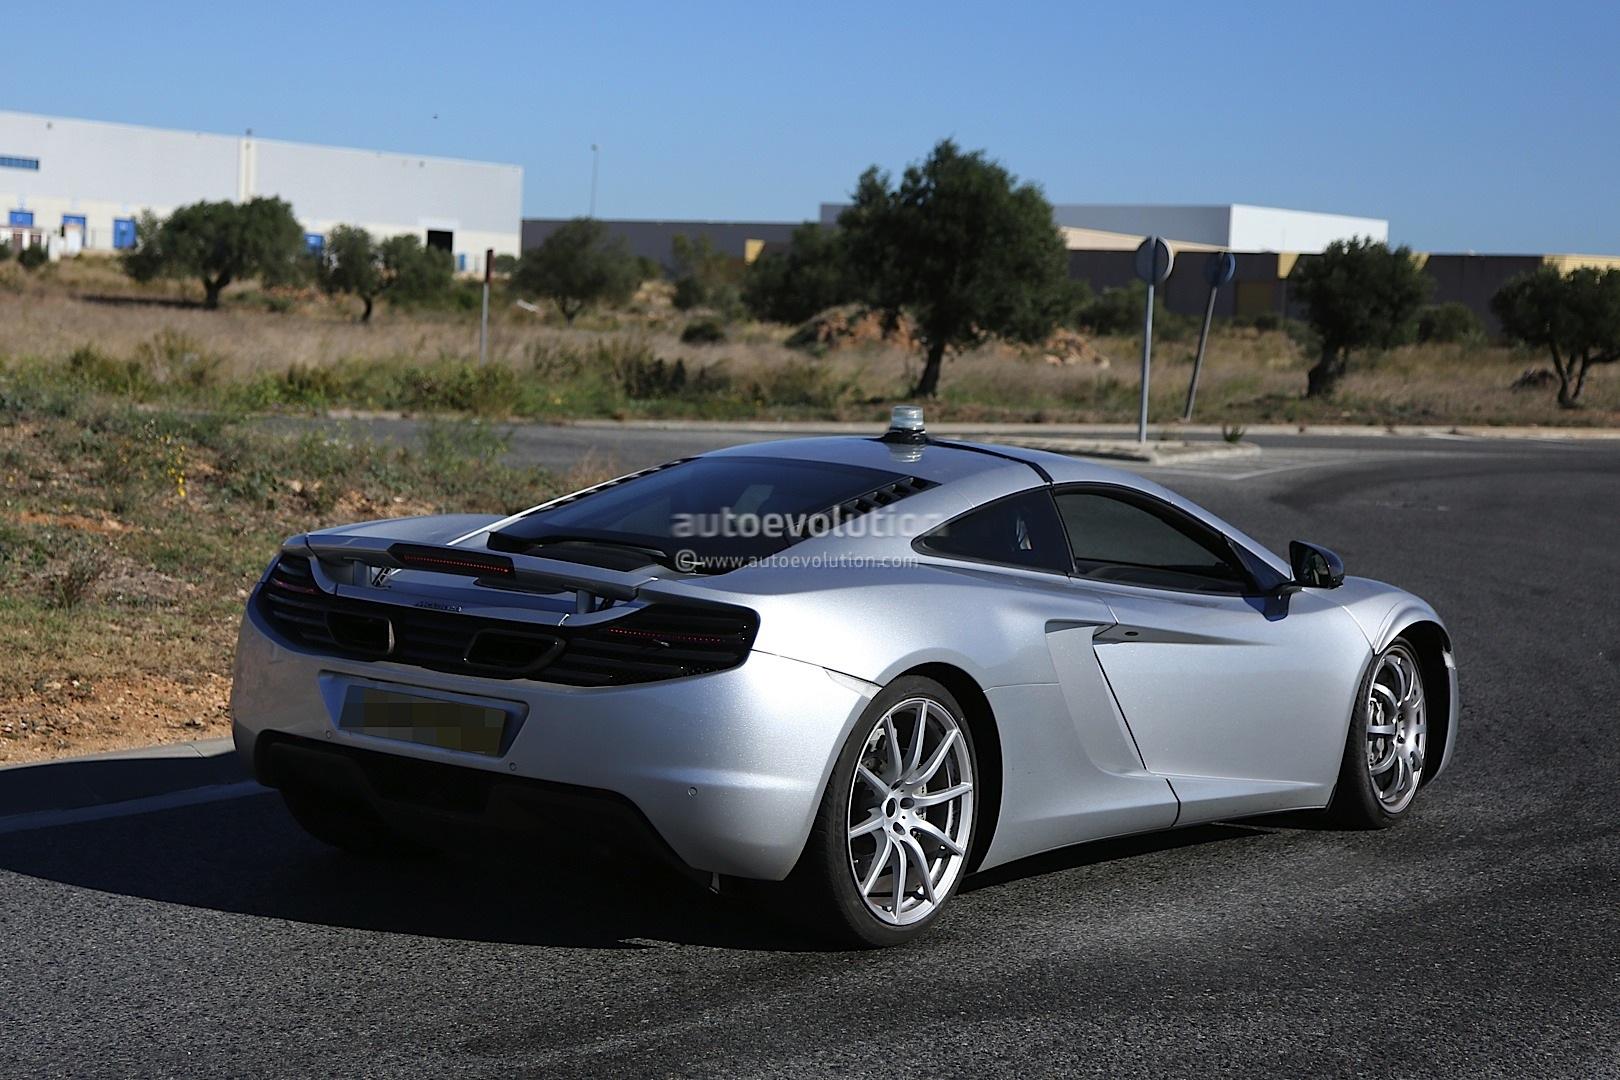 2015 - [McLaren] 570s [P13] Spyshots-mclaren-p13-sportscar-caught-chassis-testing-1080p-1